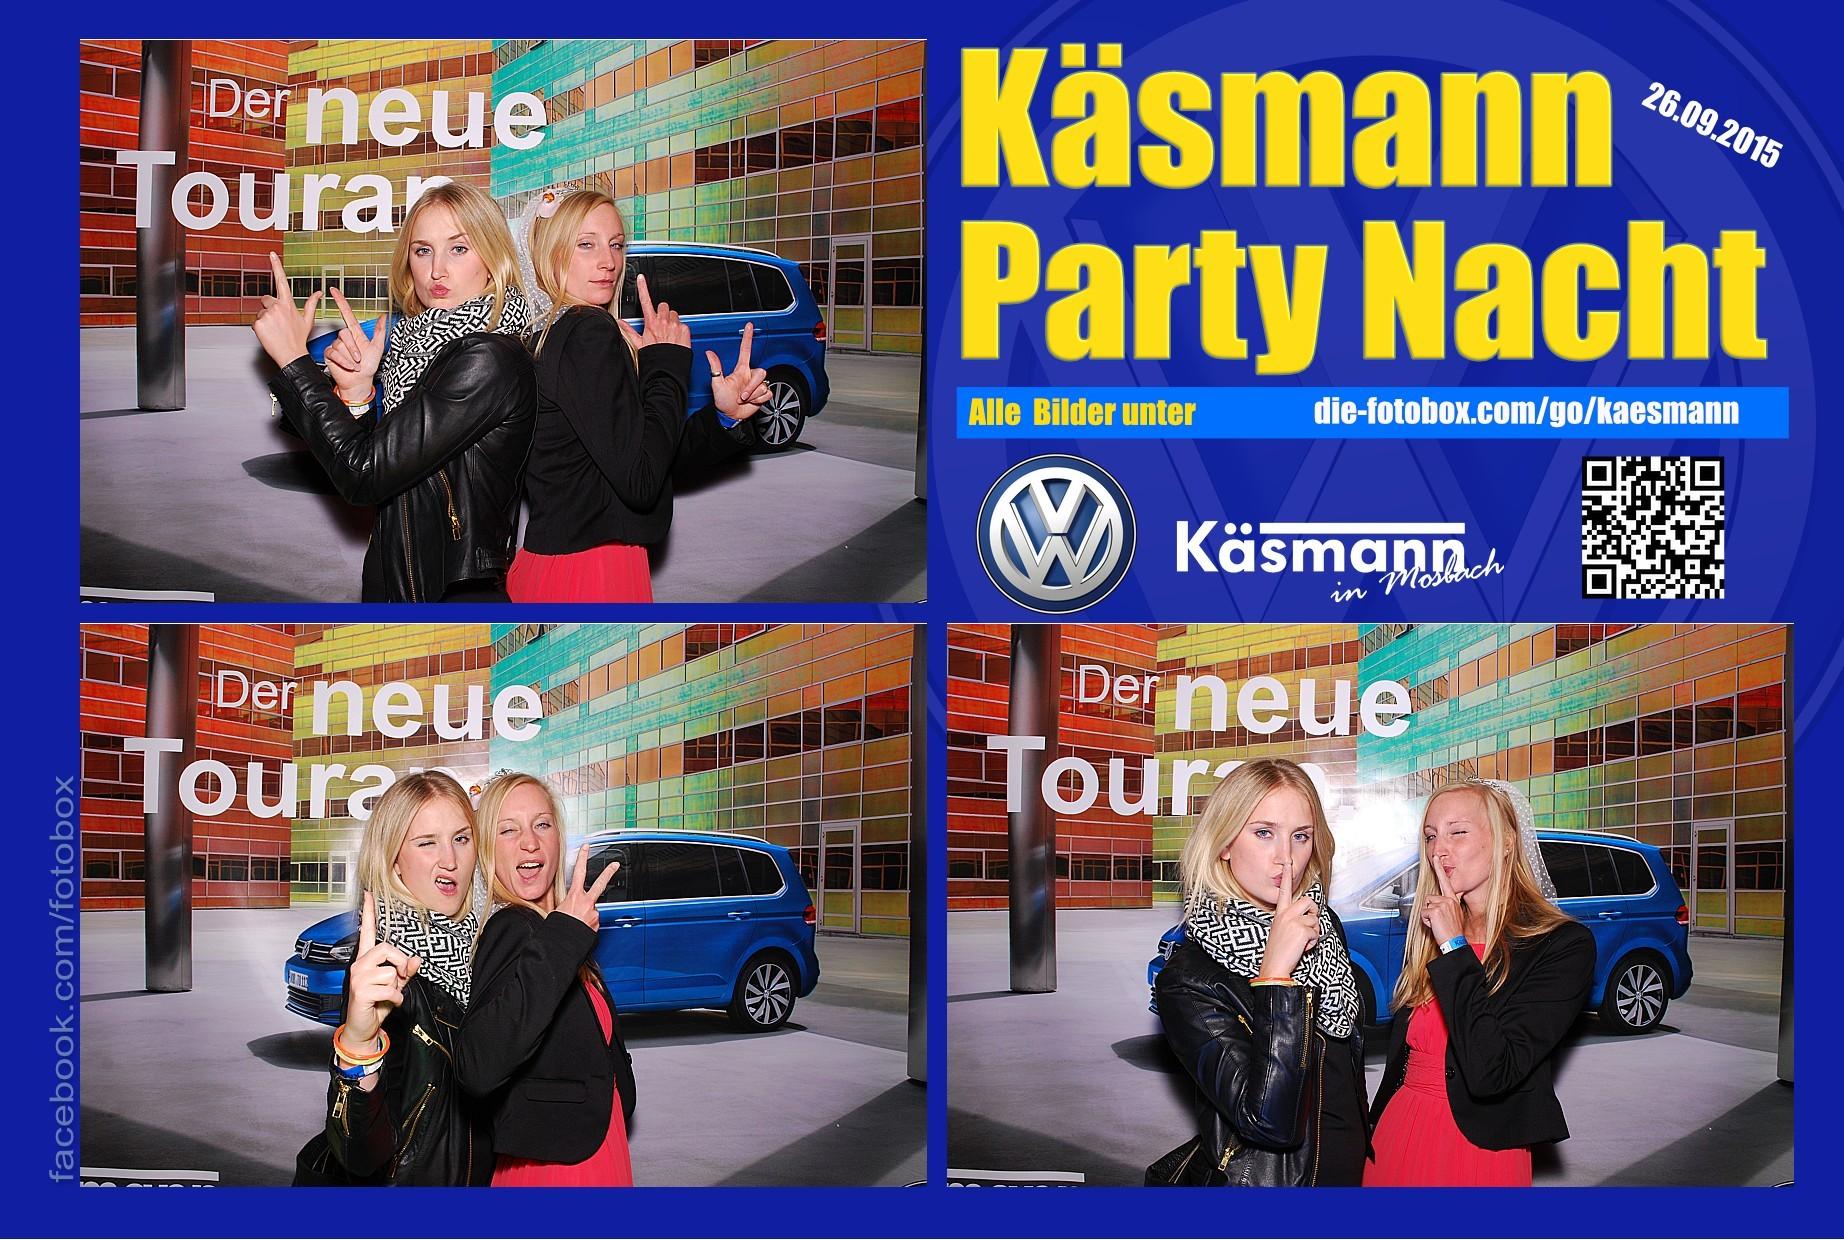 Käsmannparty 2015 - www.die-fotobox.com 01052